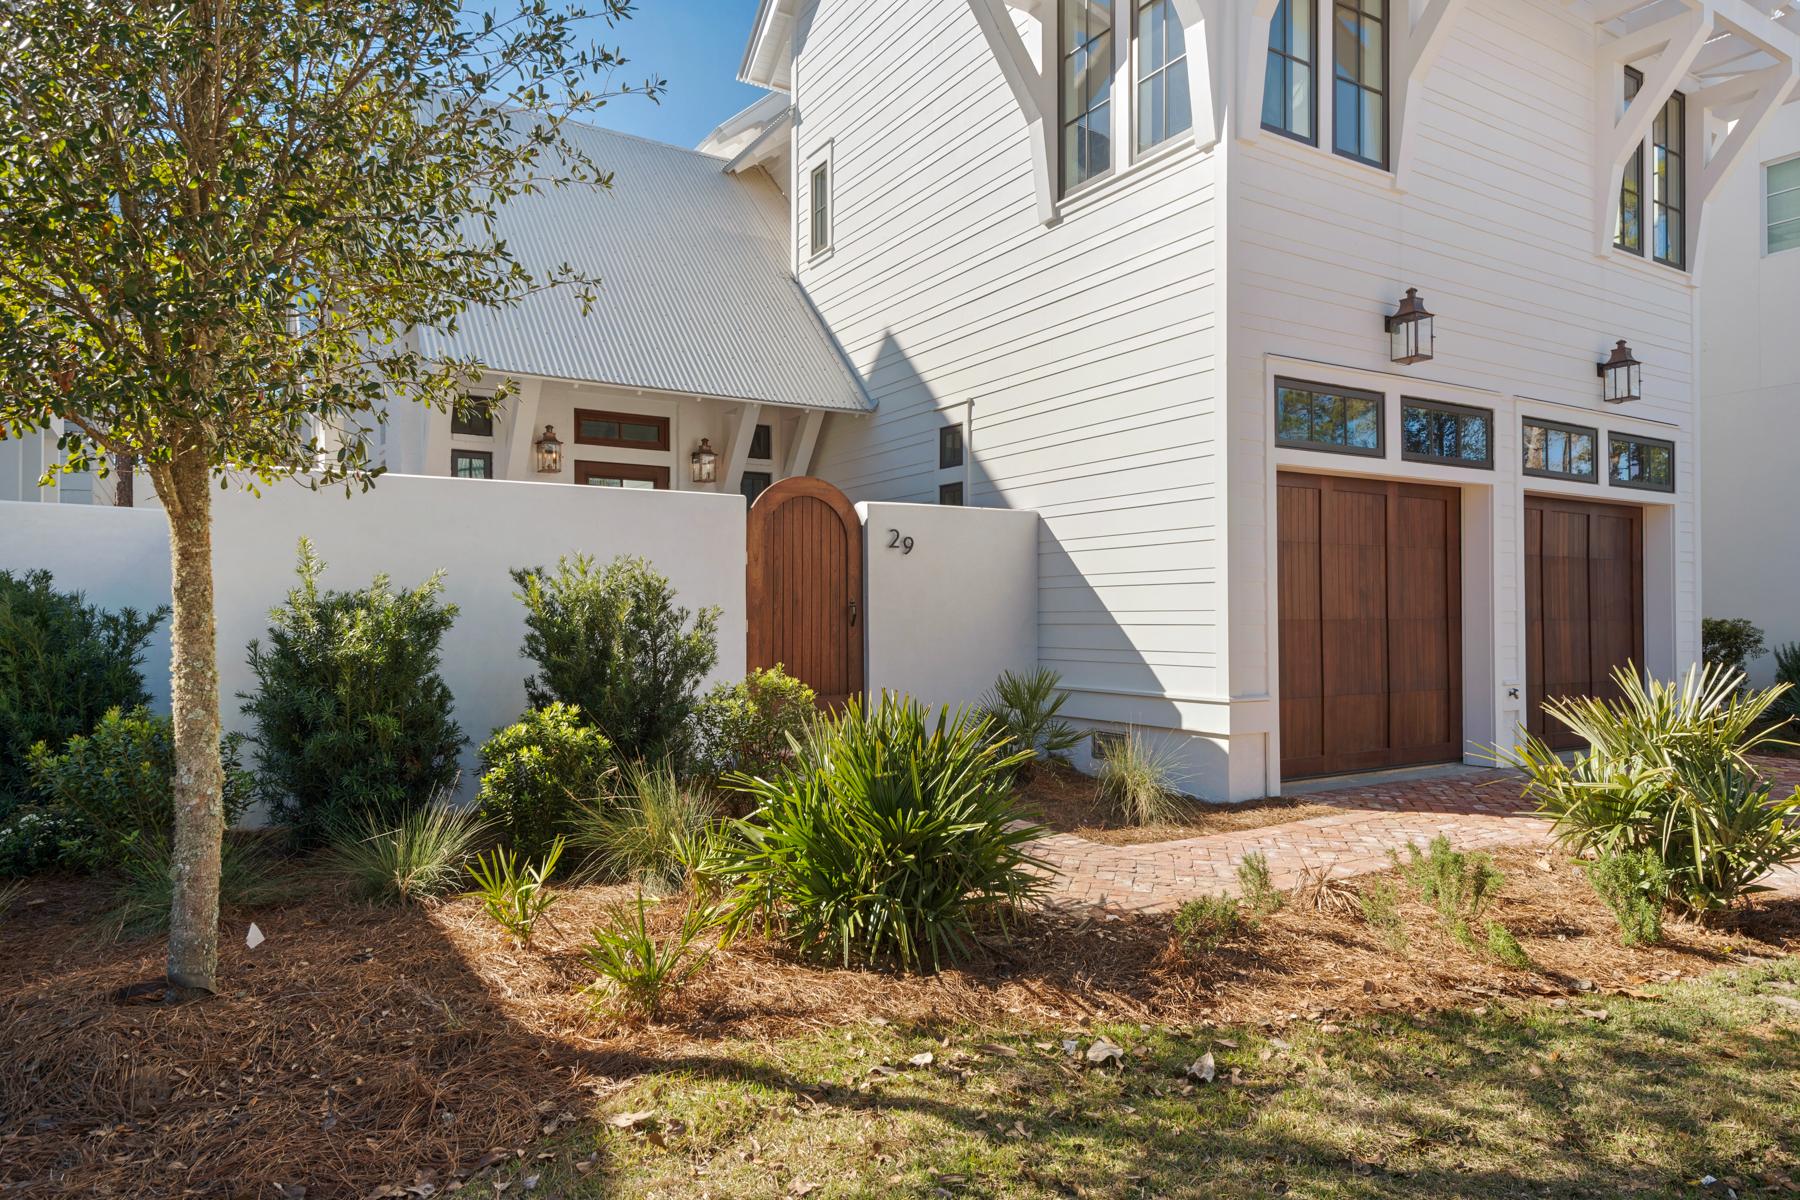 Single Family Home for Sale at NEW CONSTRUCTION IN CHURCHILL OAKS 29 Bennett Santa Rosa Beach, Florida, 32459 United States